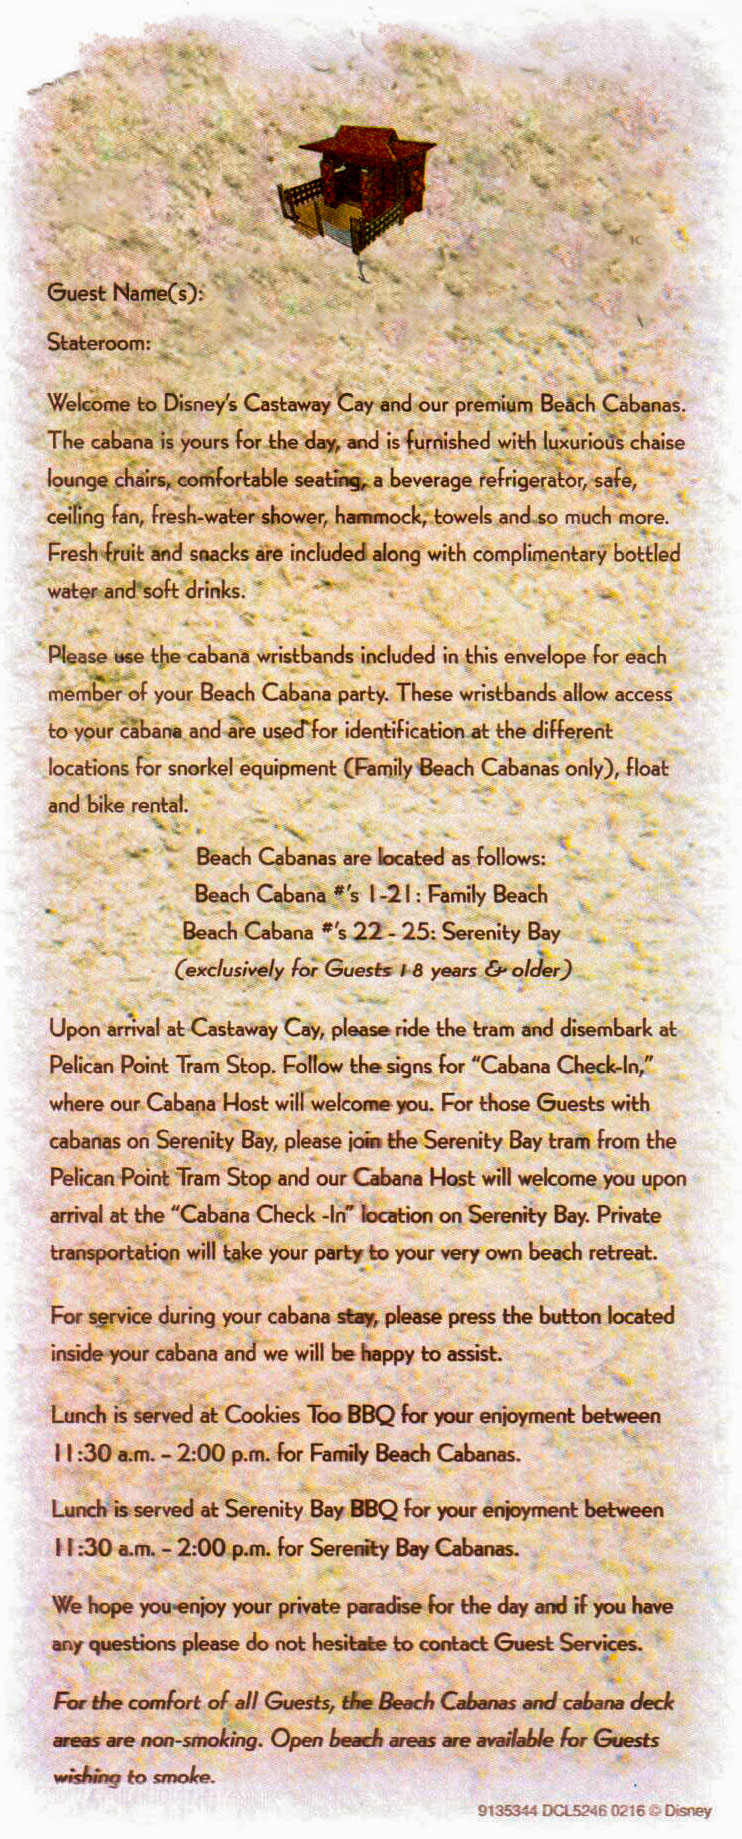 Castaway Cay Information • The Disney Cruise Line Blog on ankara map pdf, bangkok map pdf, dalian map pdf, disneyland resort map pdf, coco cay map pdf, barcelona map pdf, gibraltar map pdf, downtown dallas map pdf, nassau map pdf, downtown disney map pdf, islands of adventure map pdf, honolulu map pdf, beijing map pdf, chengdu map pdf, lisbon map pdf, disneyland park map pdf, florence map pdf, key west map pdf, auckland map pdf, disney's animal kingdom map pdf,